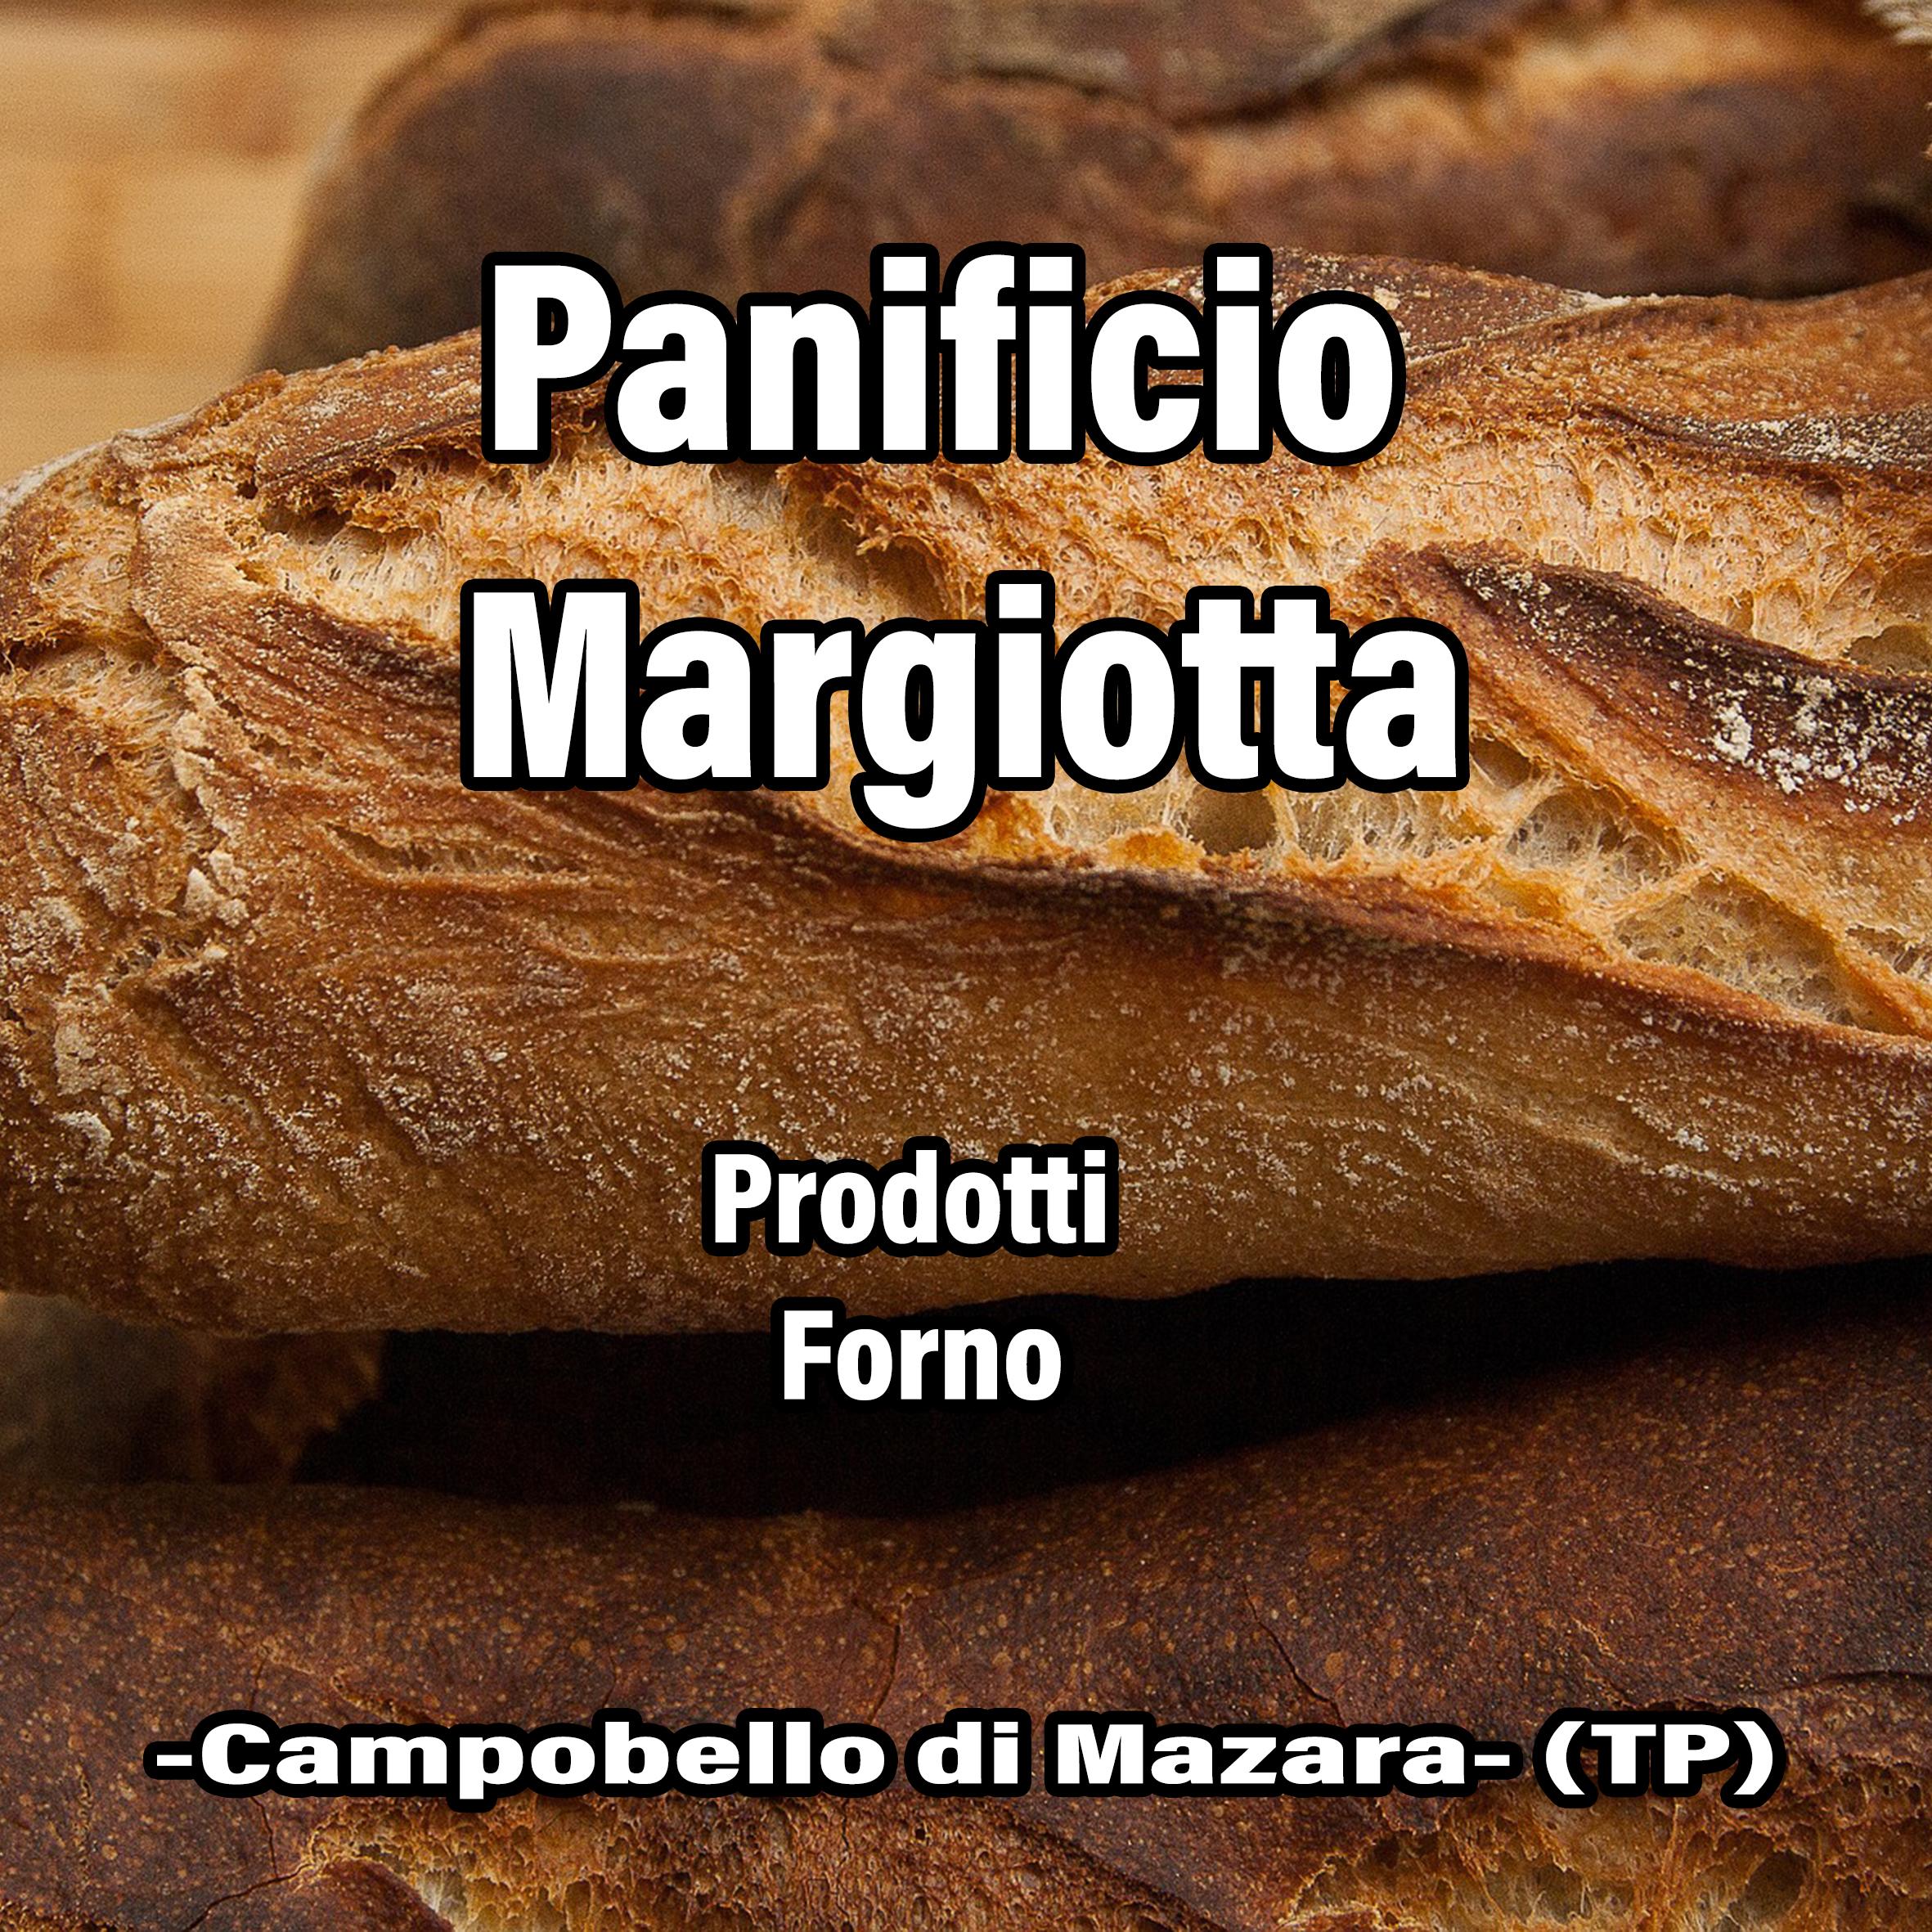 Panificio Margiotta